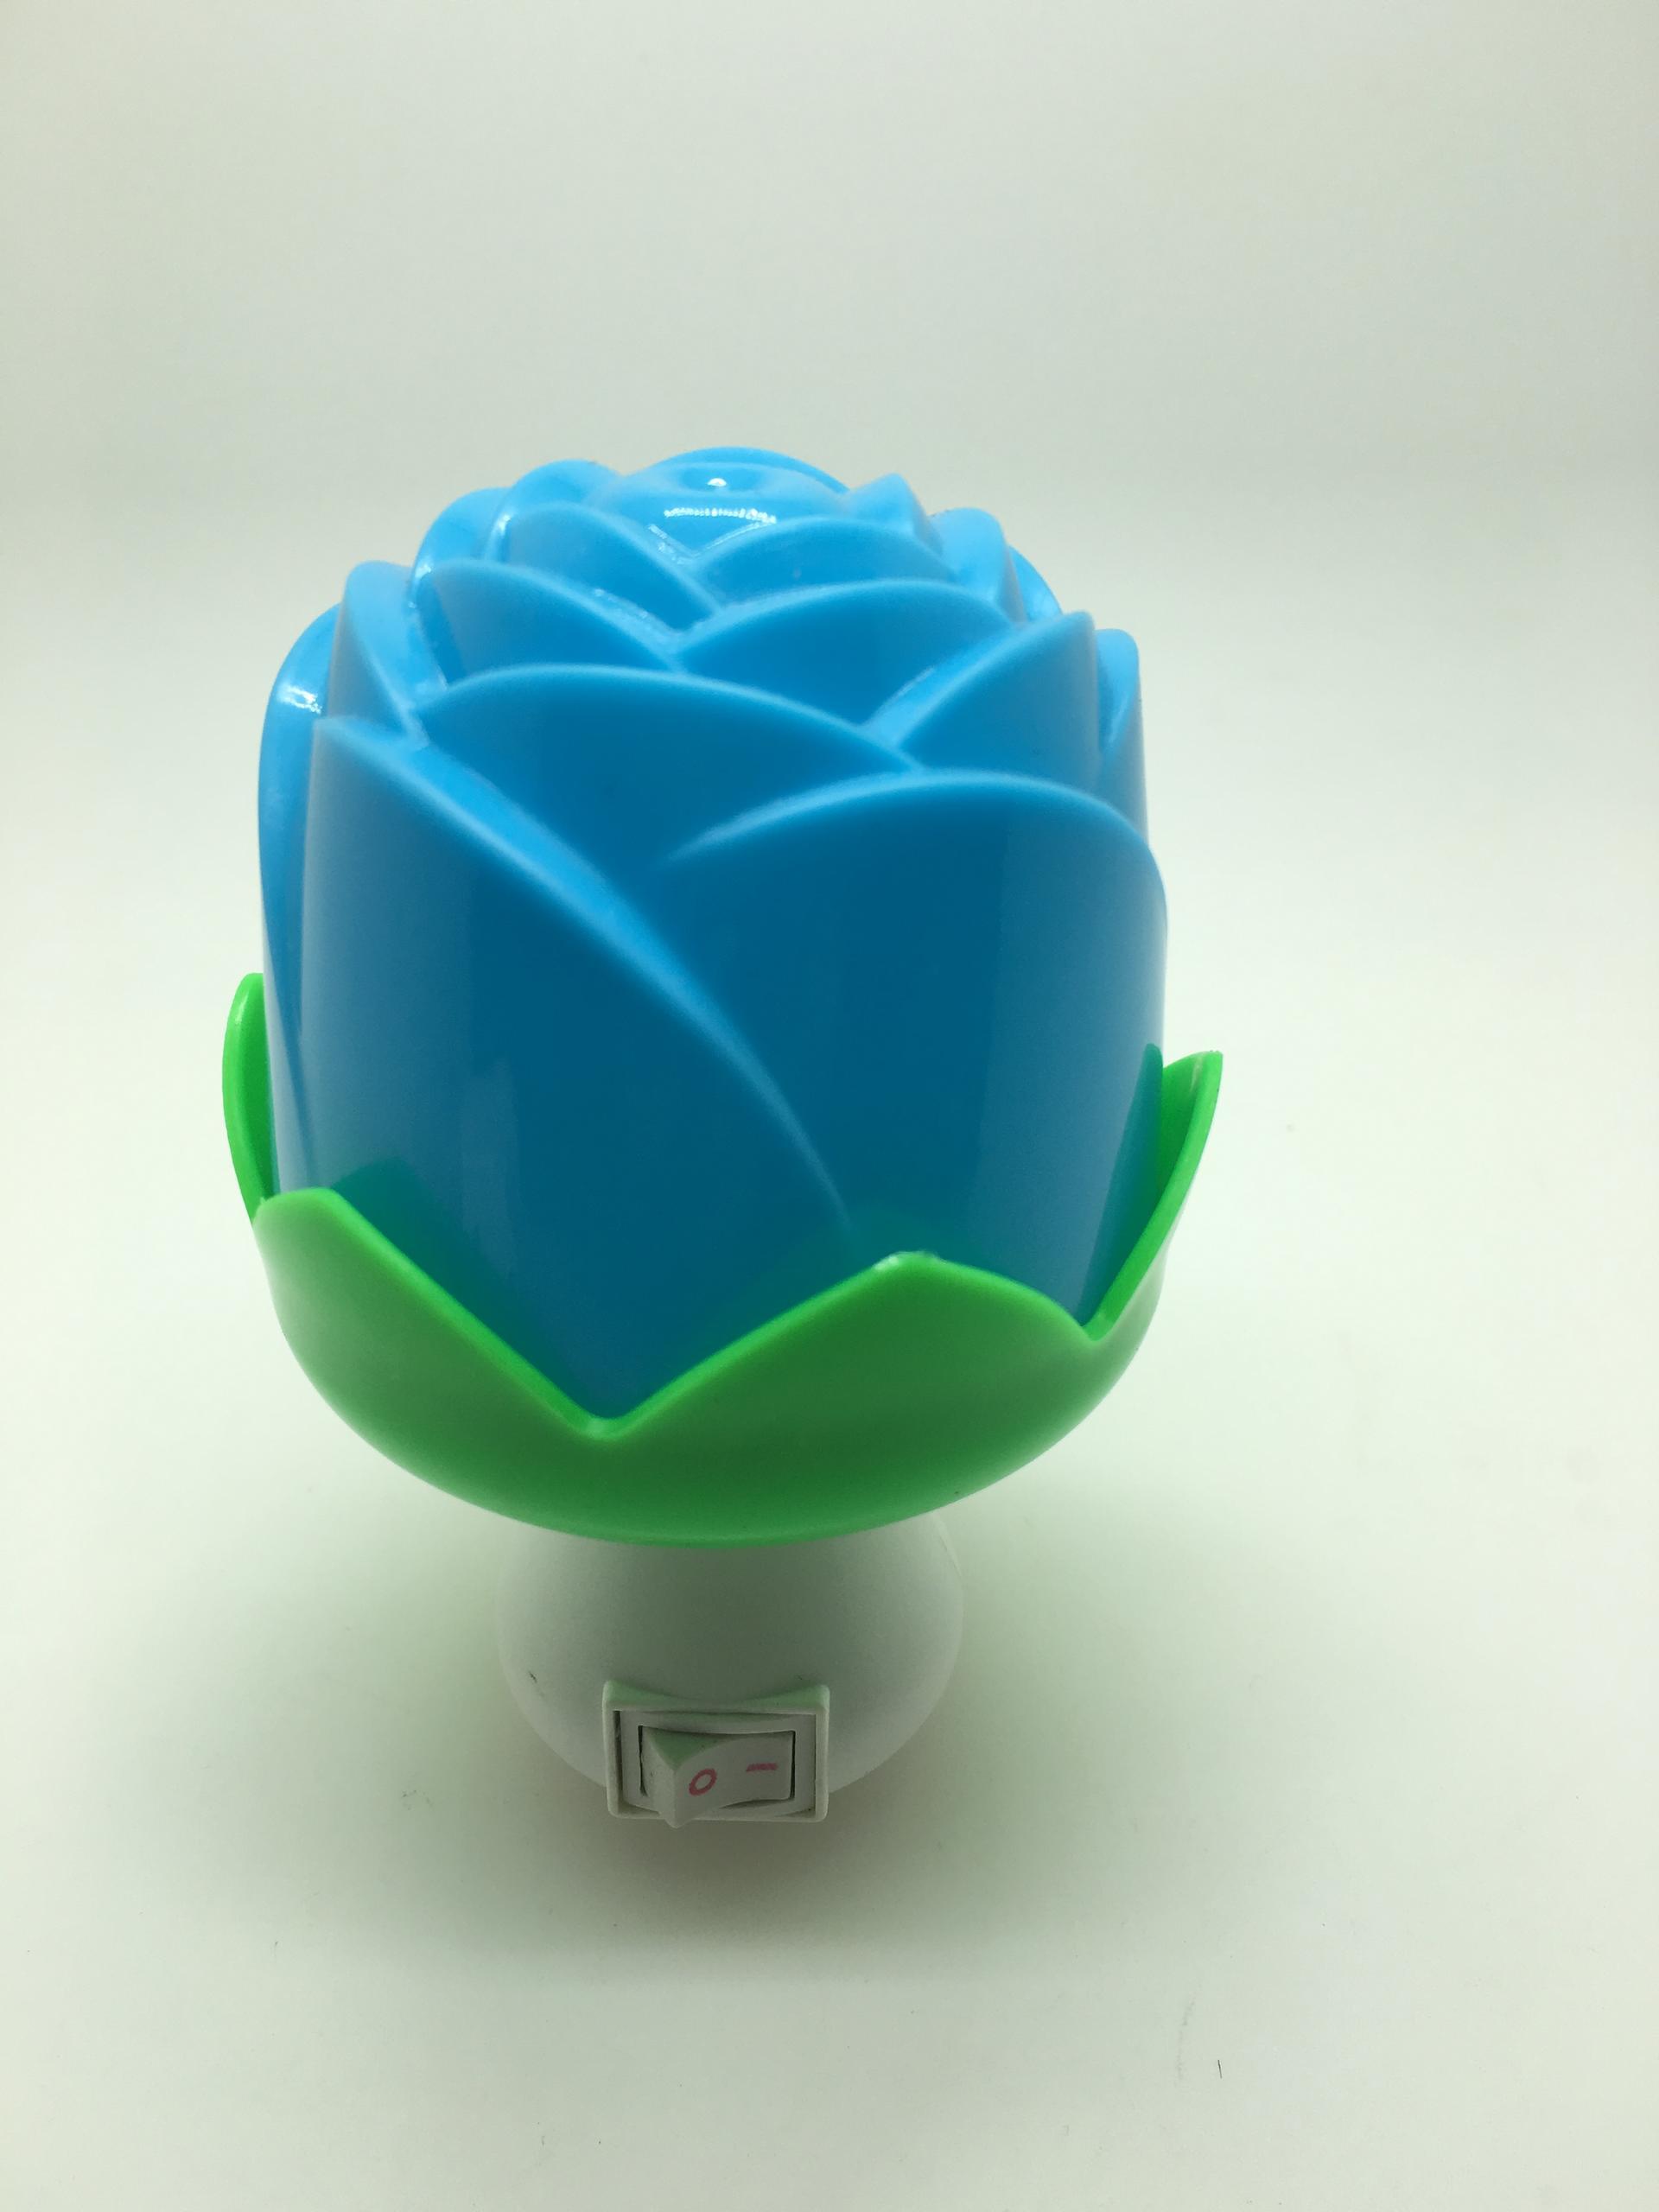 OEM 0.6W AC 110V or 220V W042 Flower rose shape 3 SMD mini switch sensor plug in night light